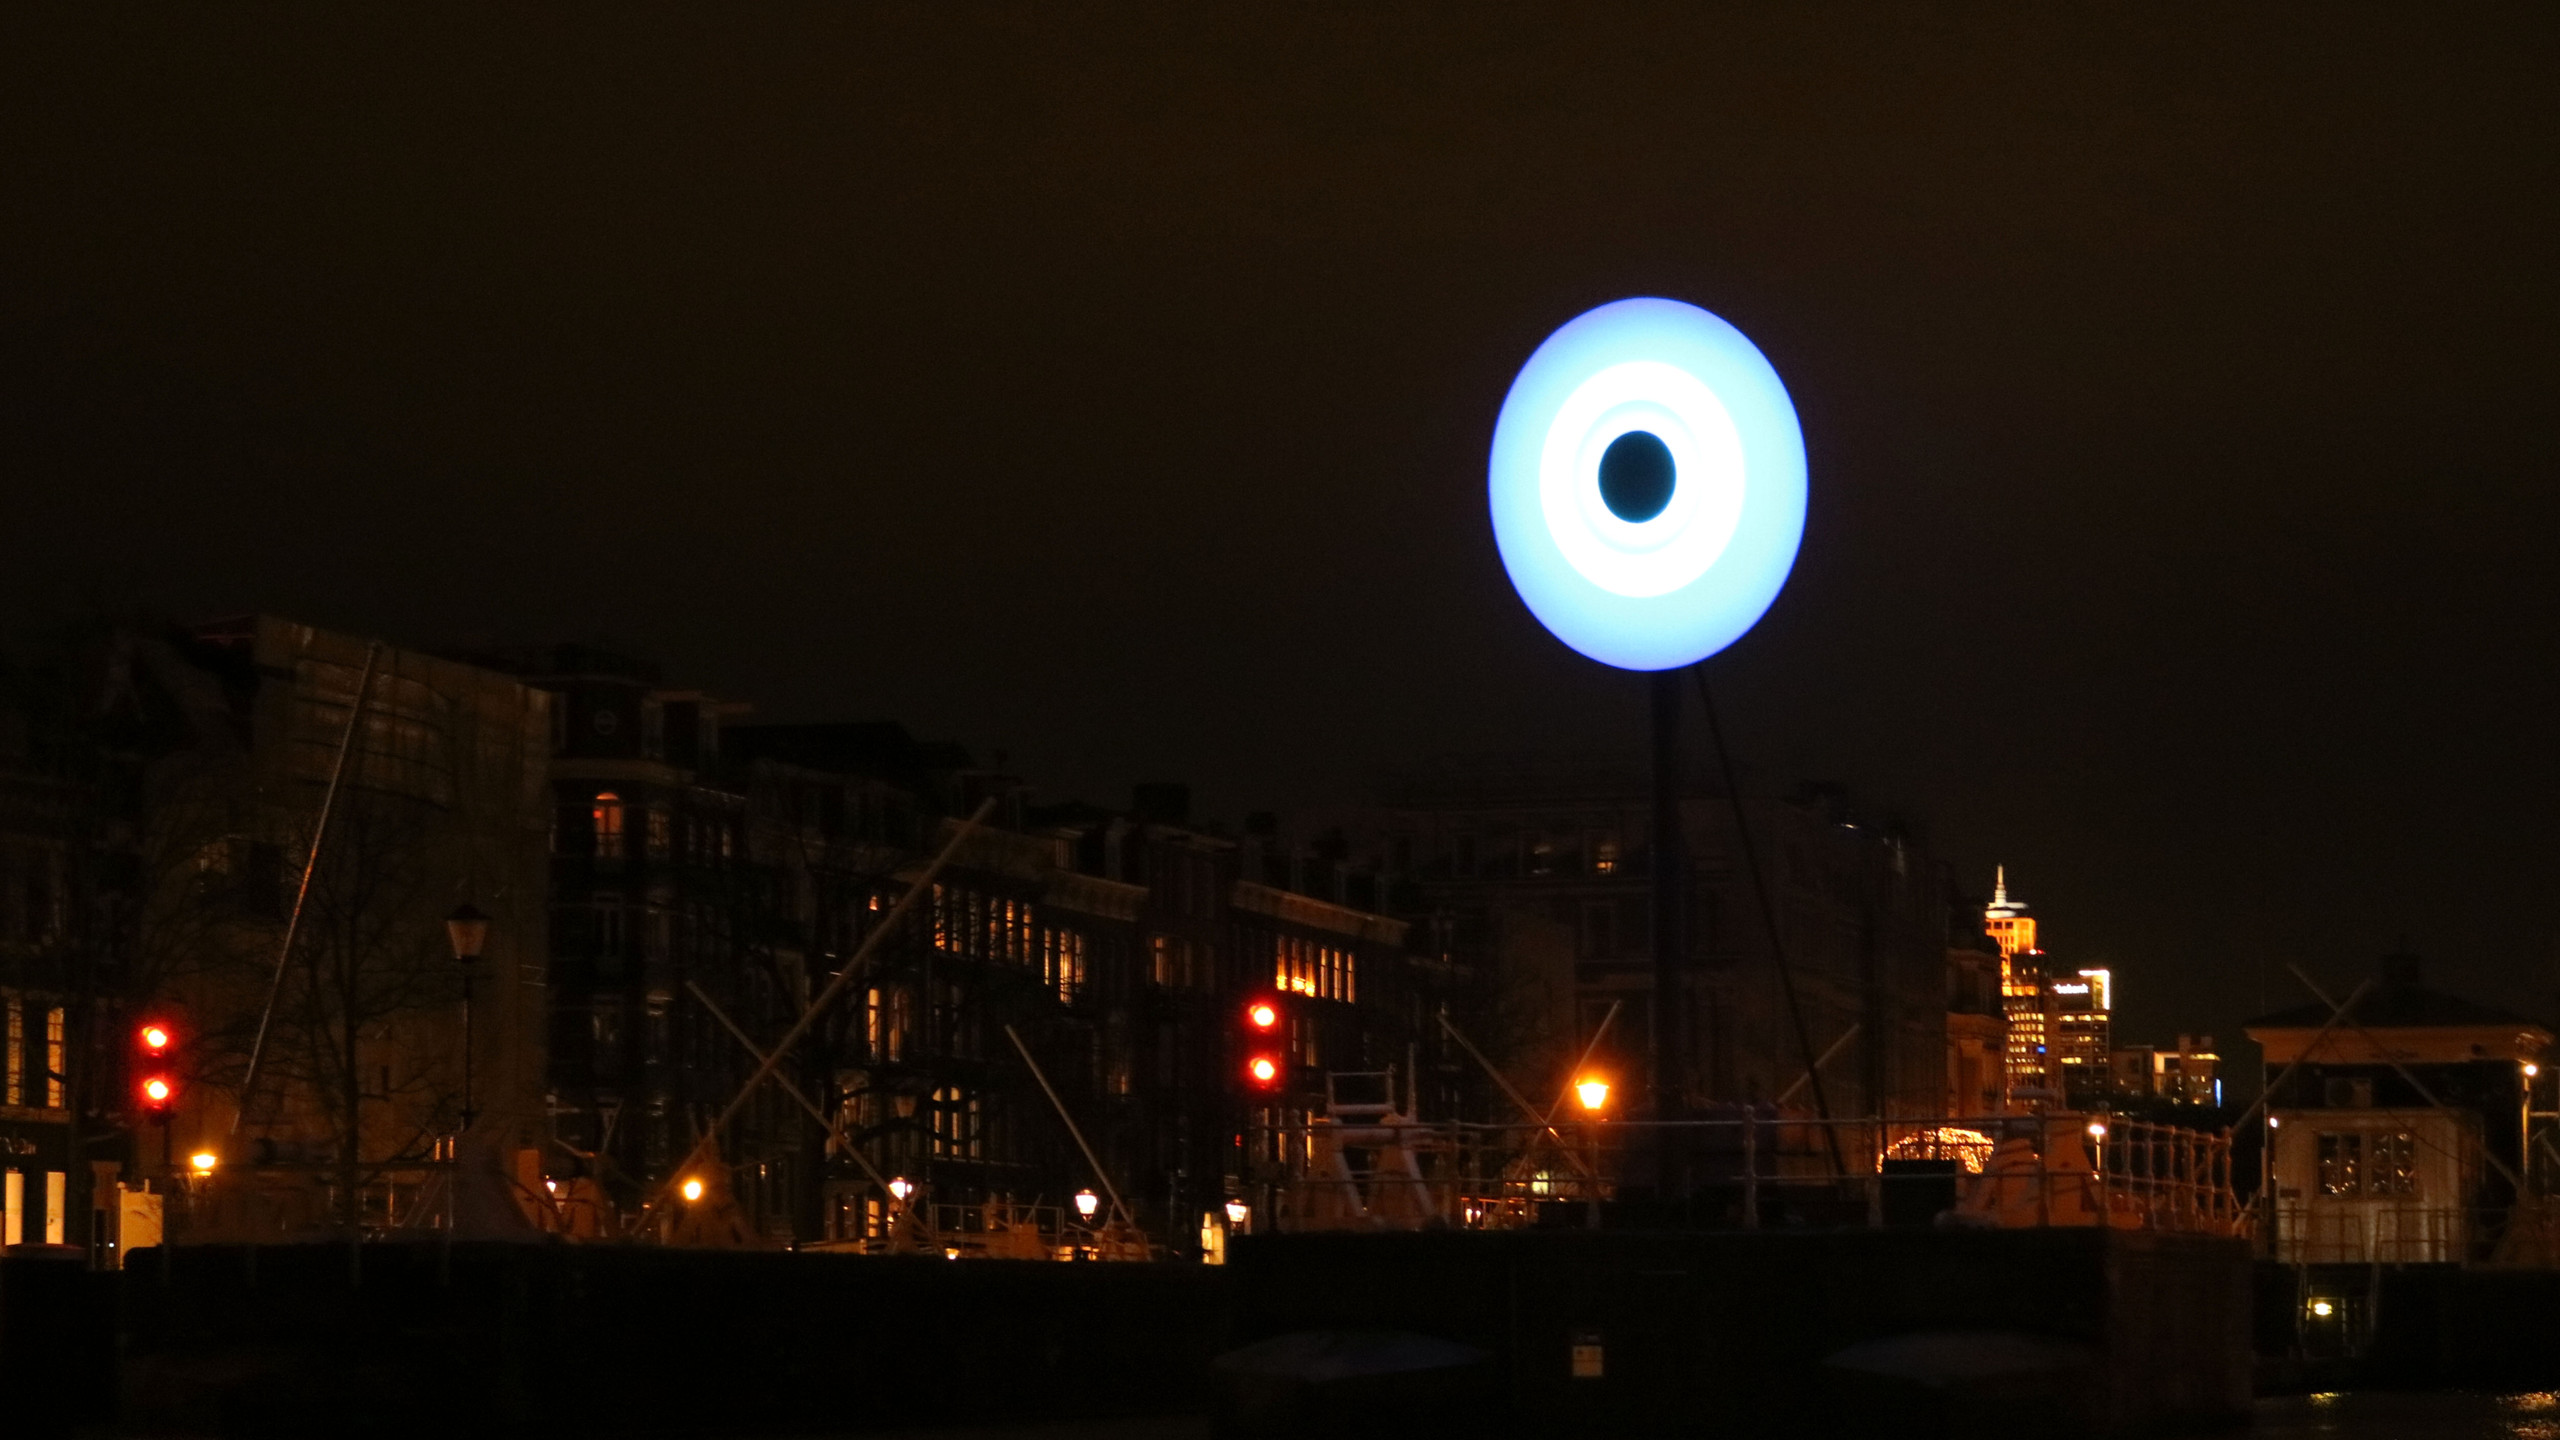 Protecting Amsterdam against evil. - Driton Selmani